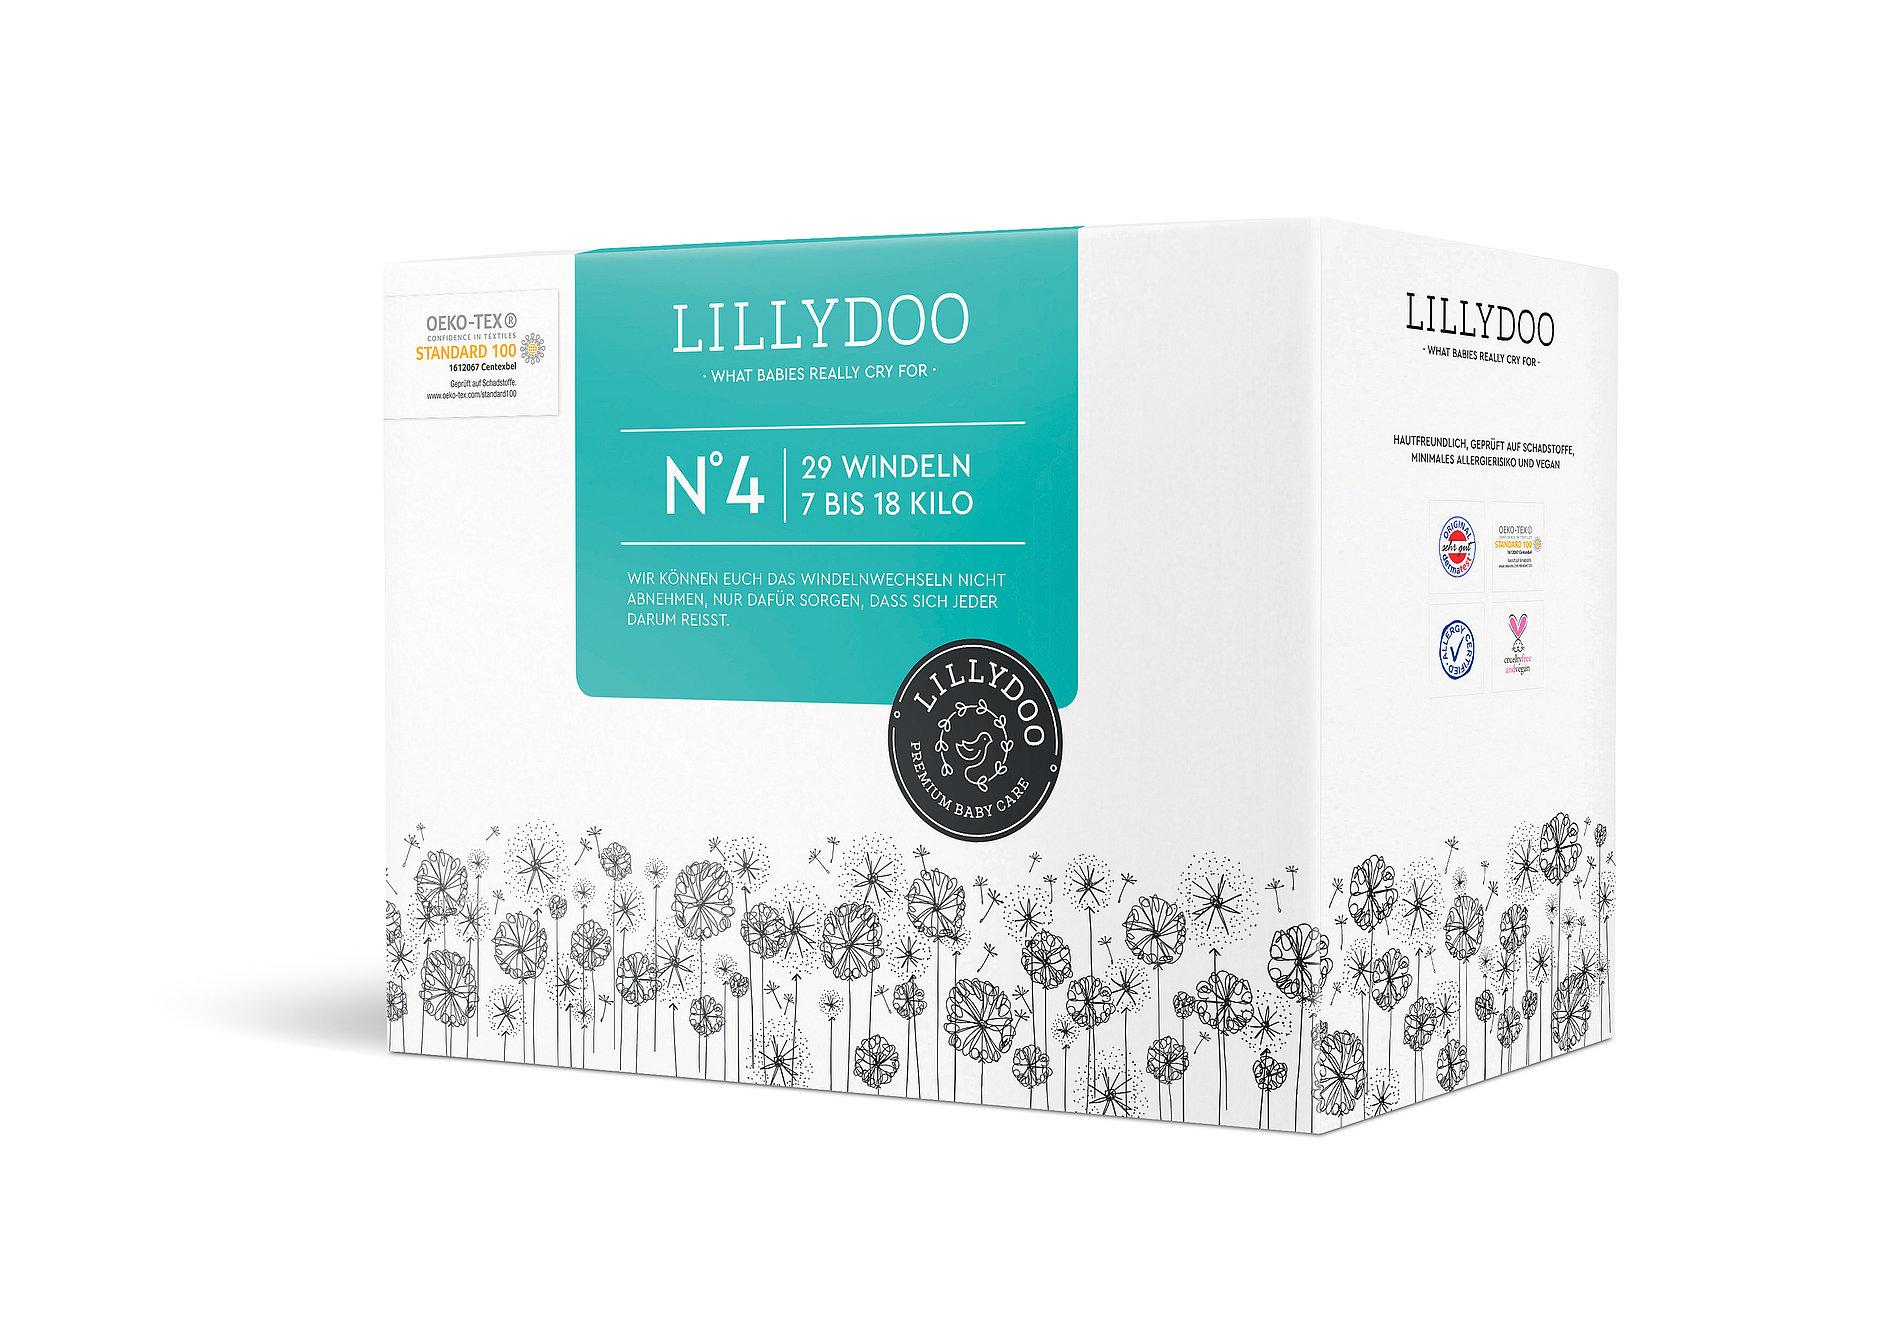 LILLYDOO | Red Dot Design Award